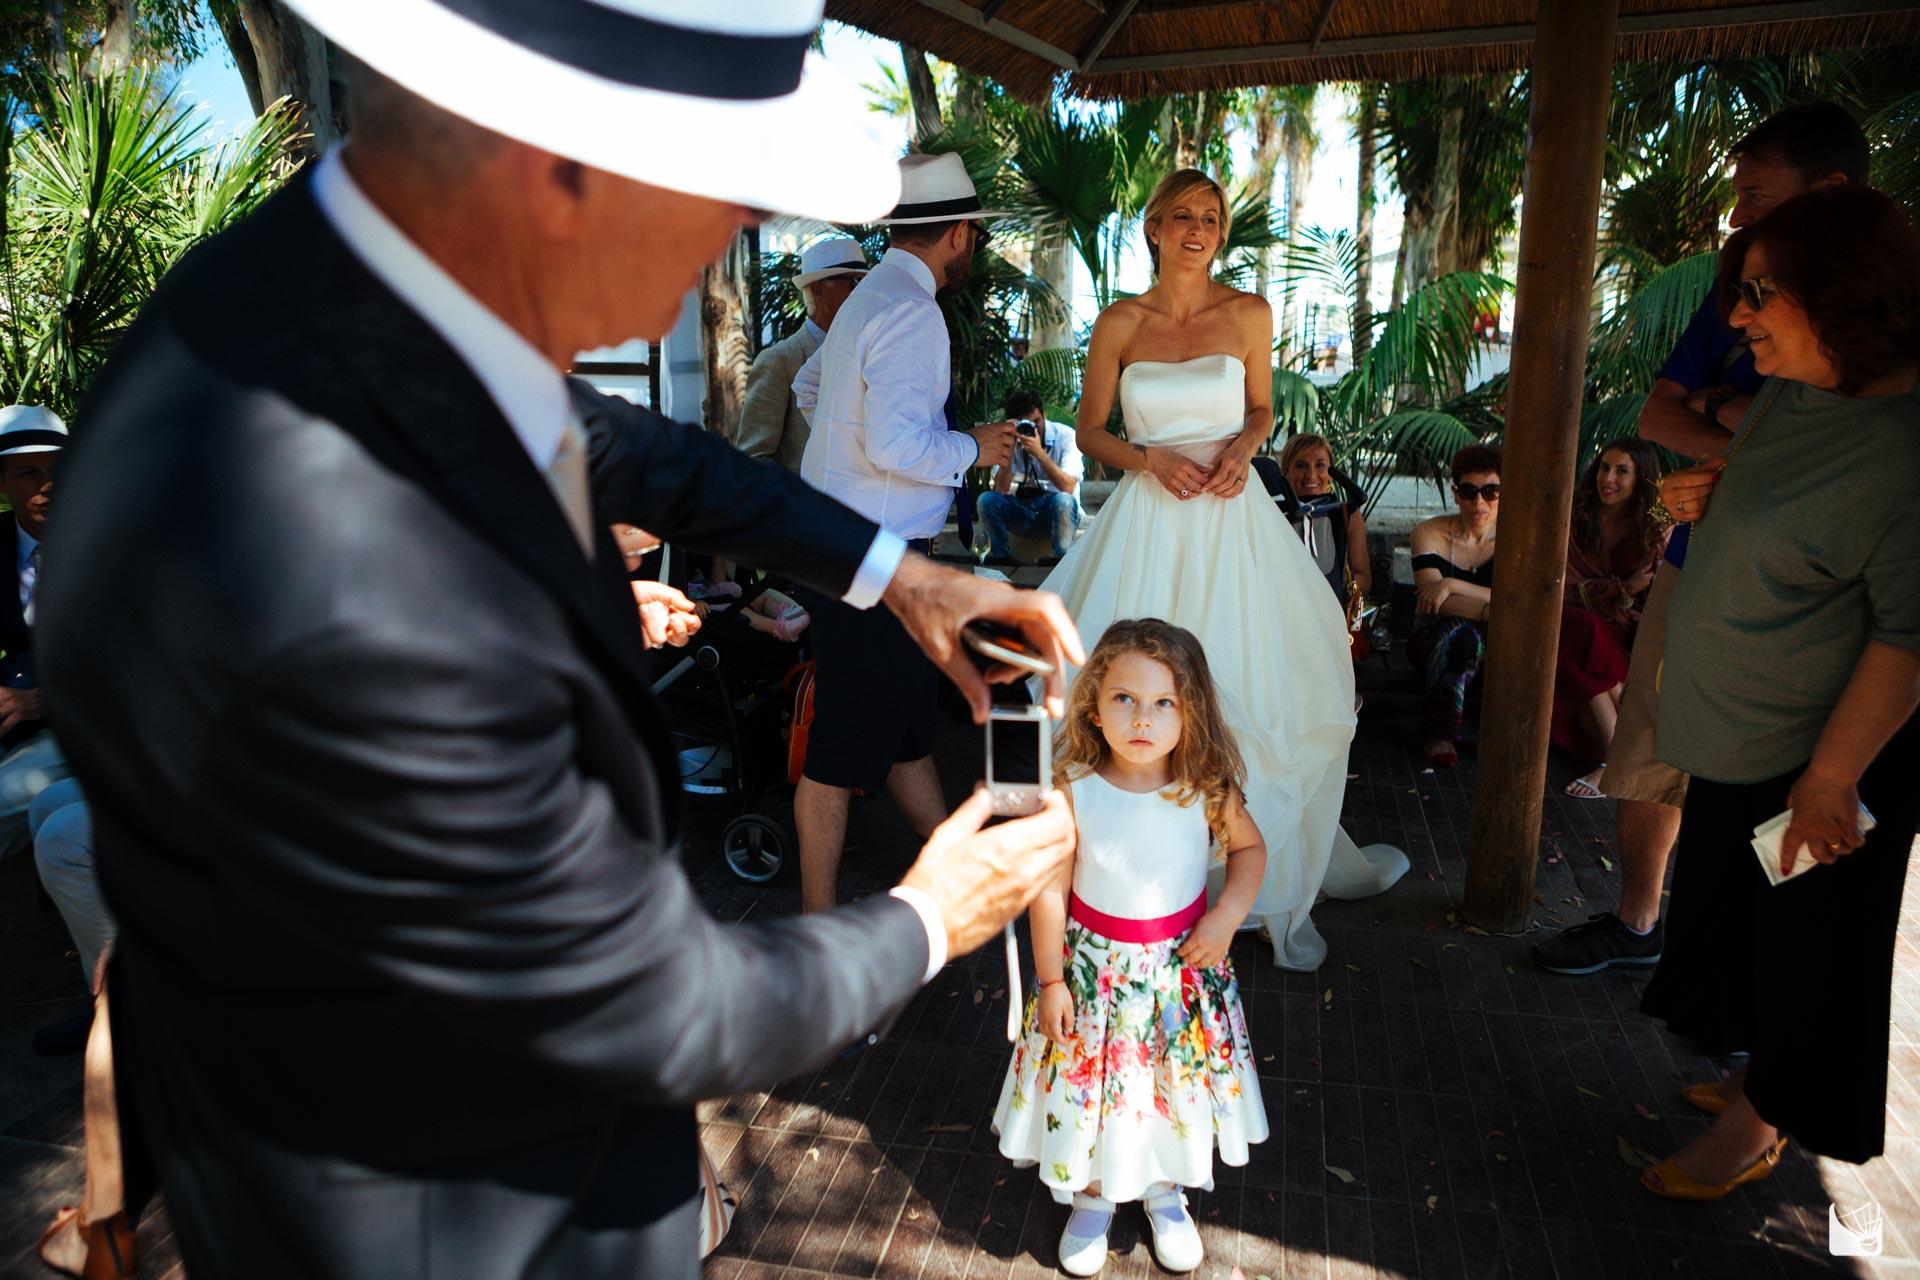 wedding_in_marzamemi-39.jpg